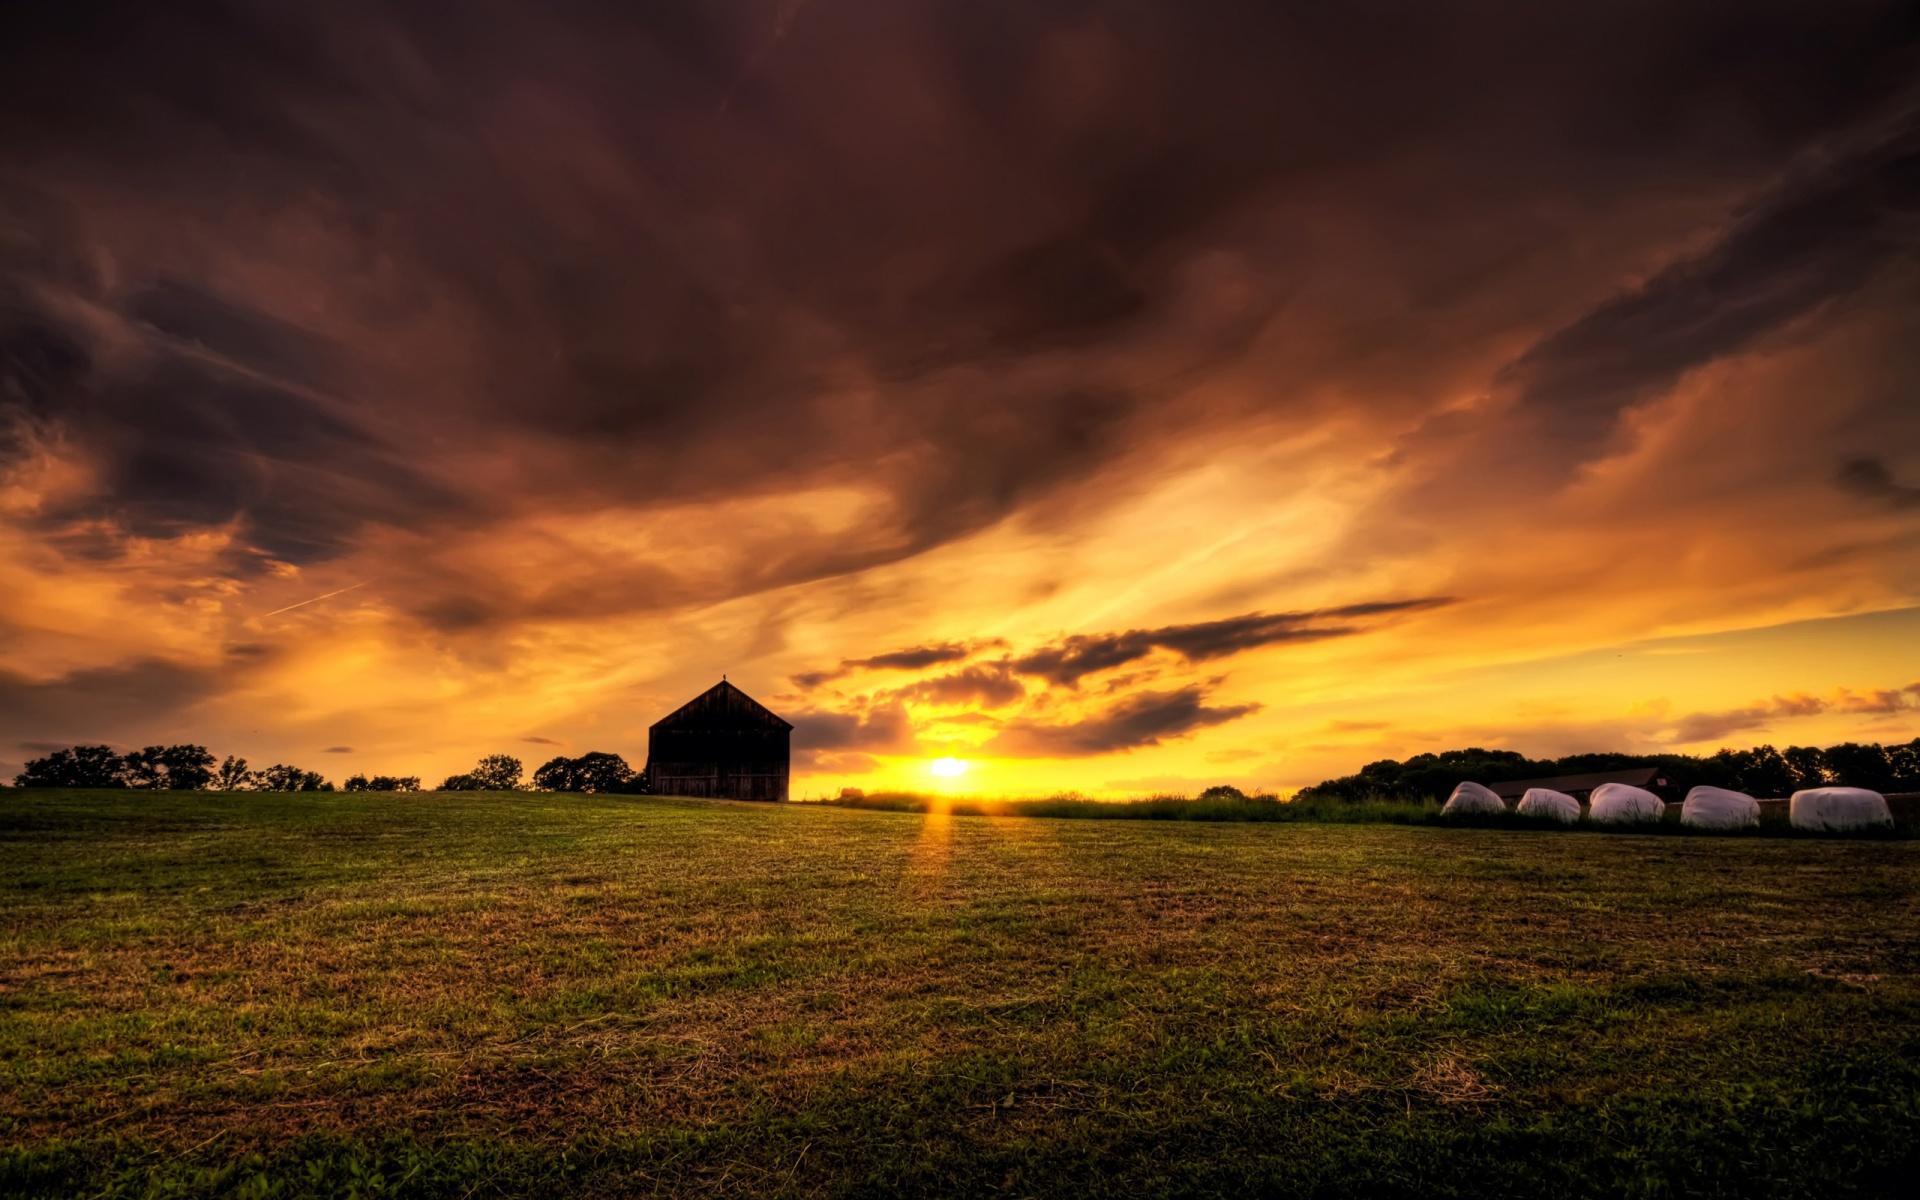 http://4.bp.blogspot.com/-R3siNCooEr8/Ubwtpq9zgpI/AAAAAAAAVlg/yZfKJD94sc4/s1920/over-the-sunset-1200.jpg